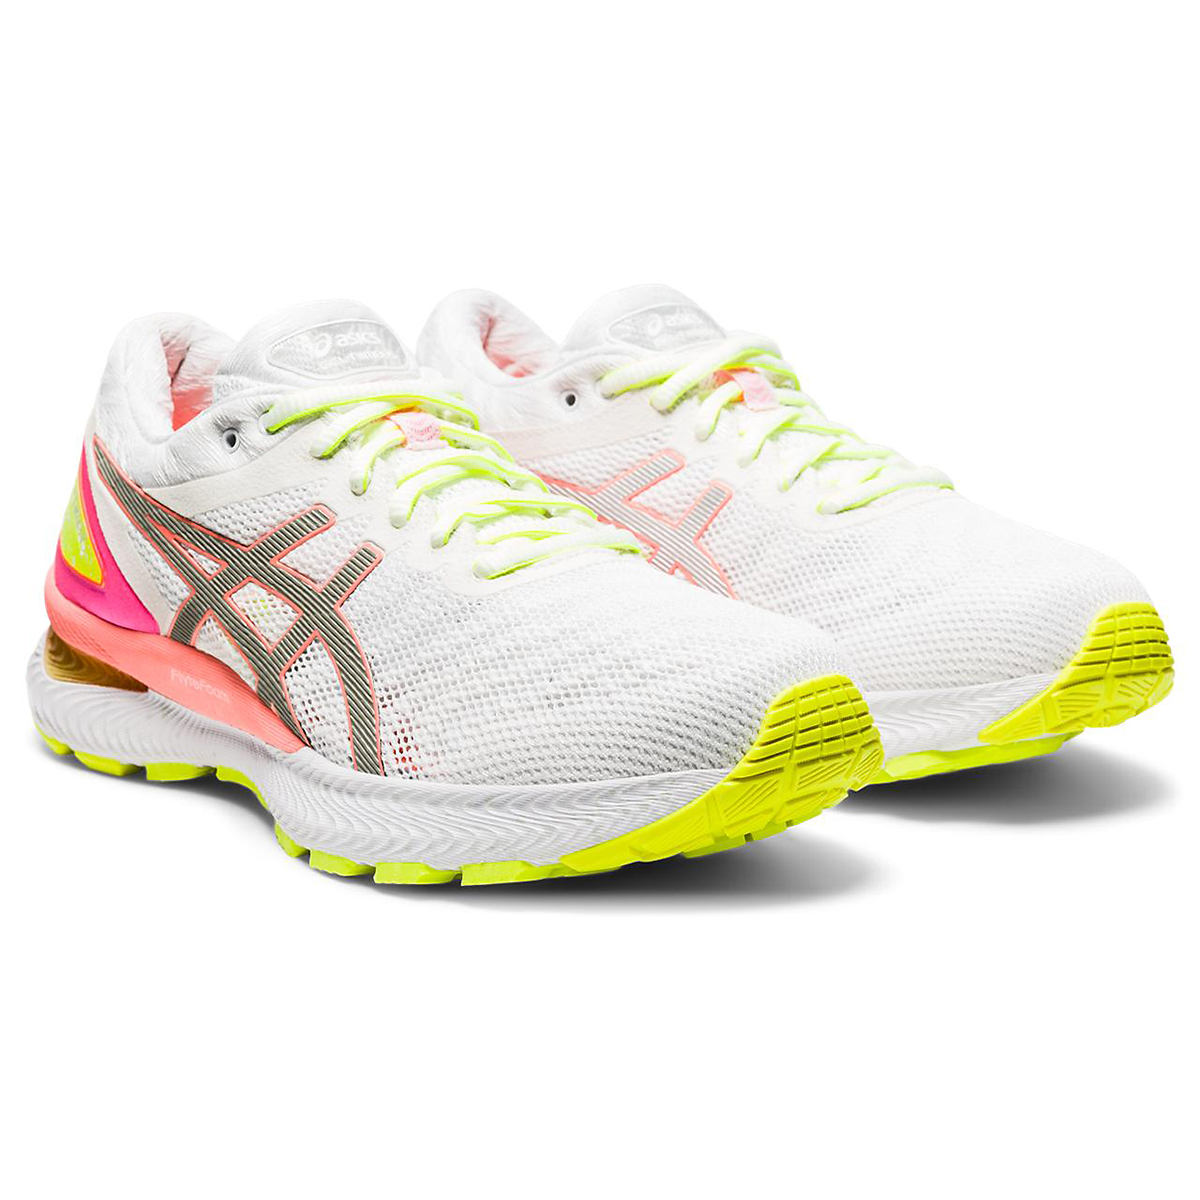 Women's Asics Gel-Nimbus 22 Lite Show Running Shoe - Color: White/Sun Coral - Size: 5 - Width: Regular, White/Sun Coral, large, image 2